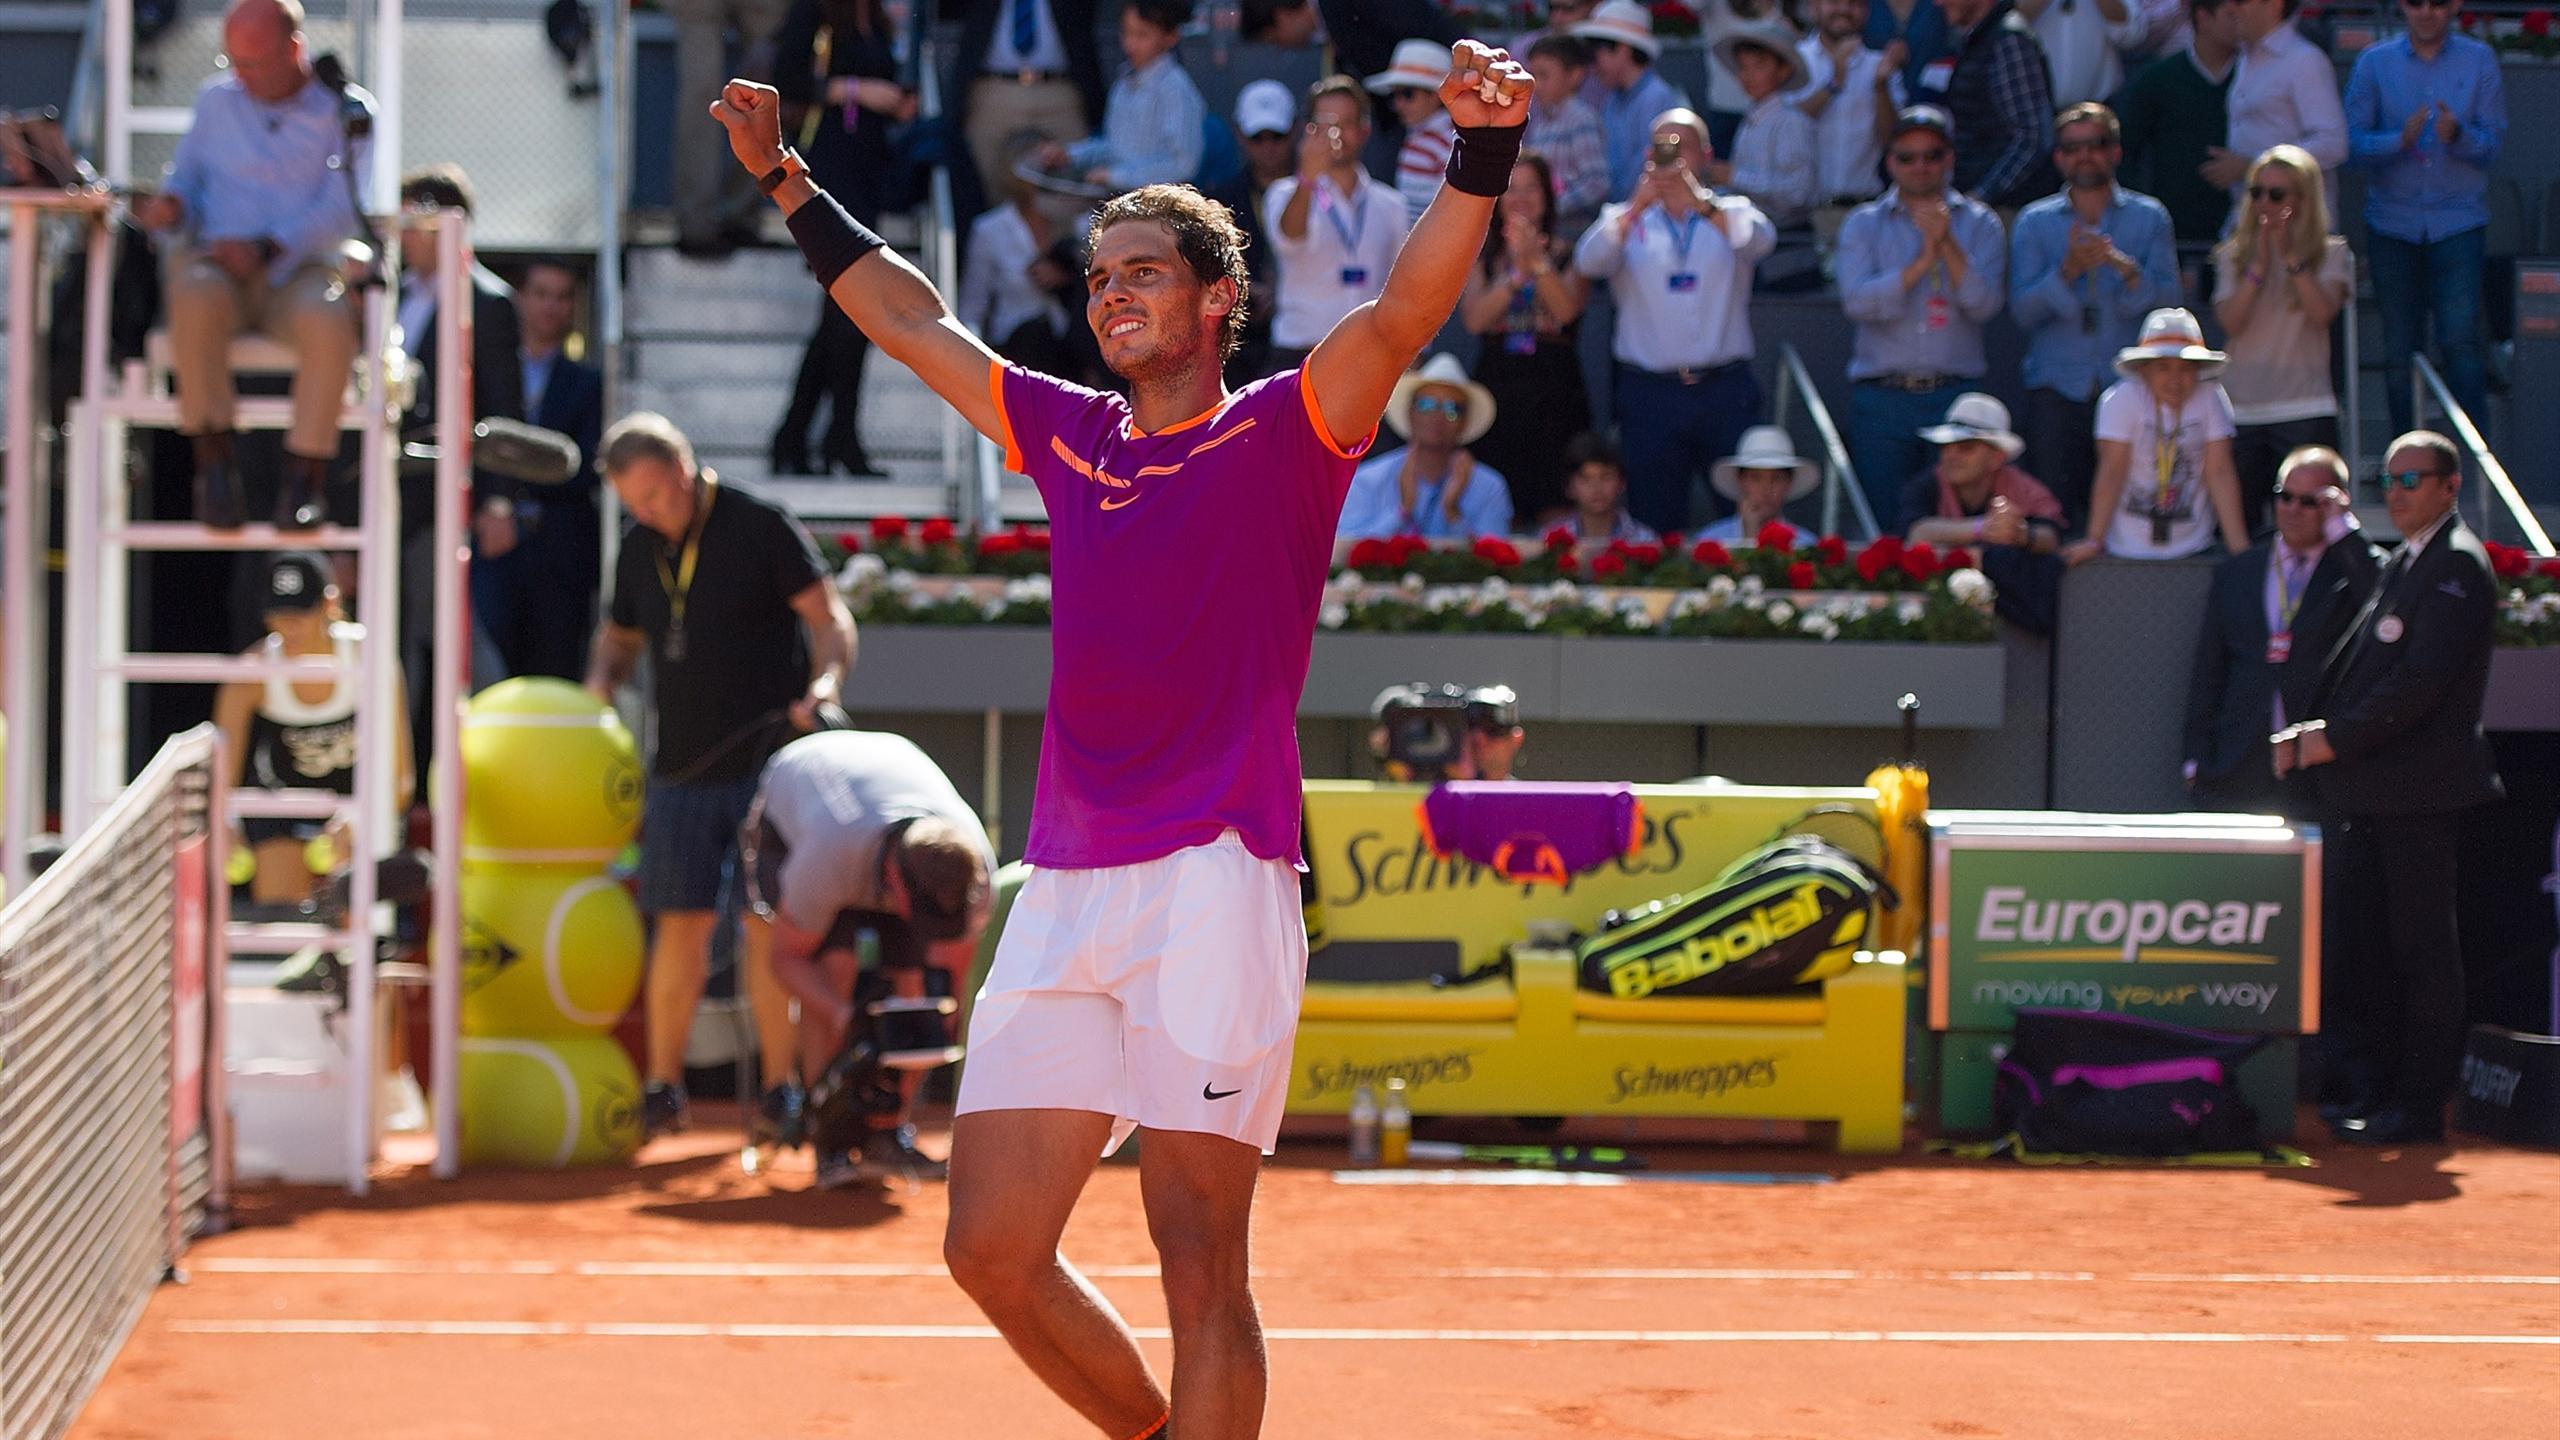 Nadal destroys Kukushkin - Monte Carlo Masters 2012